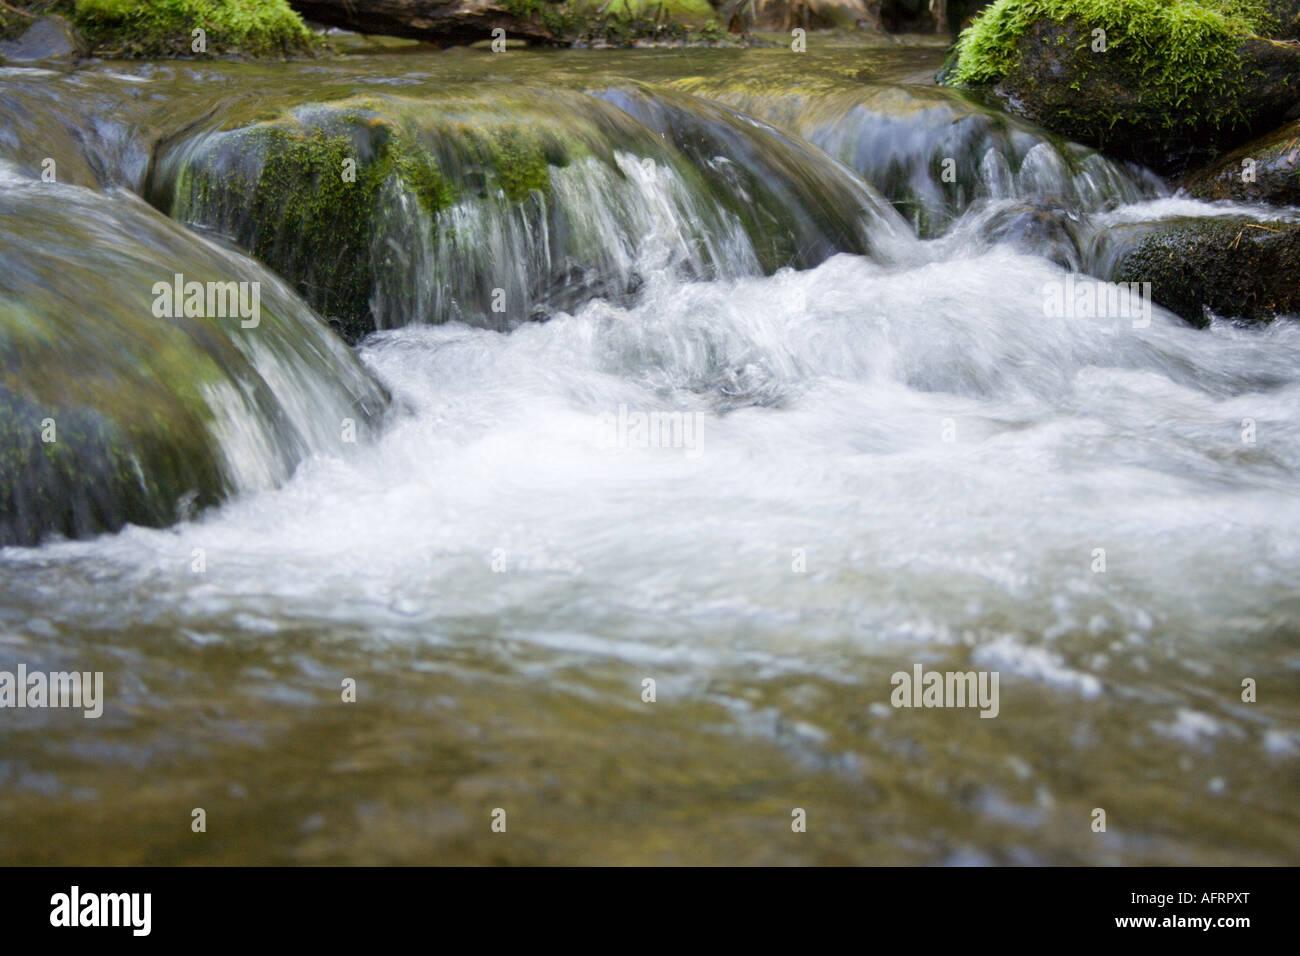 mountain stream running over mossy rocks in siberia - Stock Image